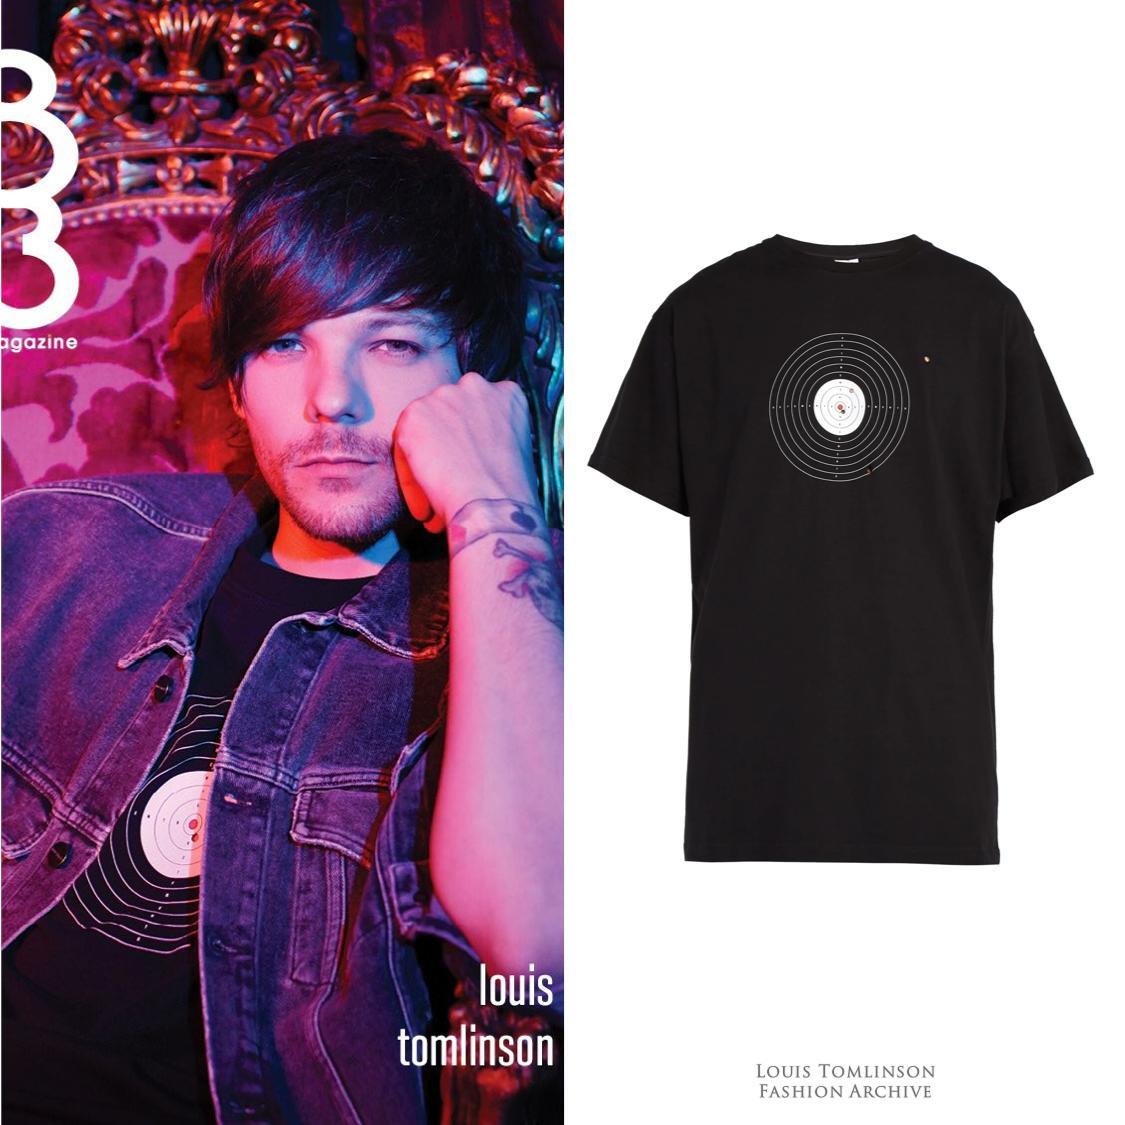 fb061a8d5fa5 Louis Tomlinson Fashion (@ltfasharchive) | Twitter